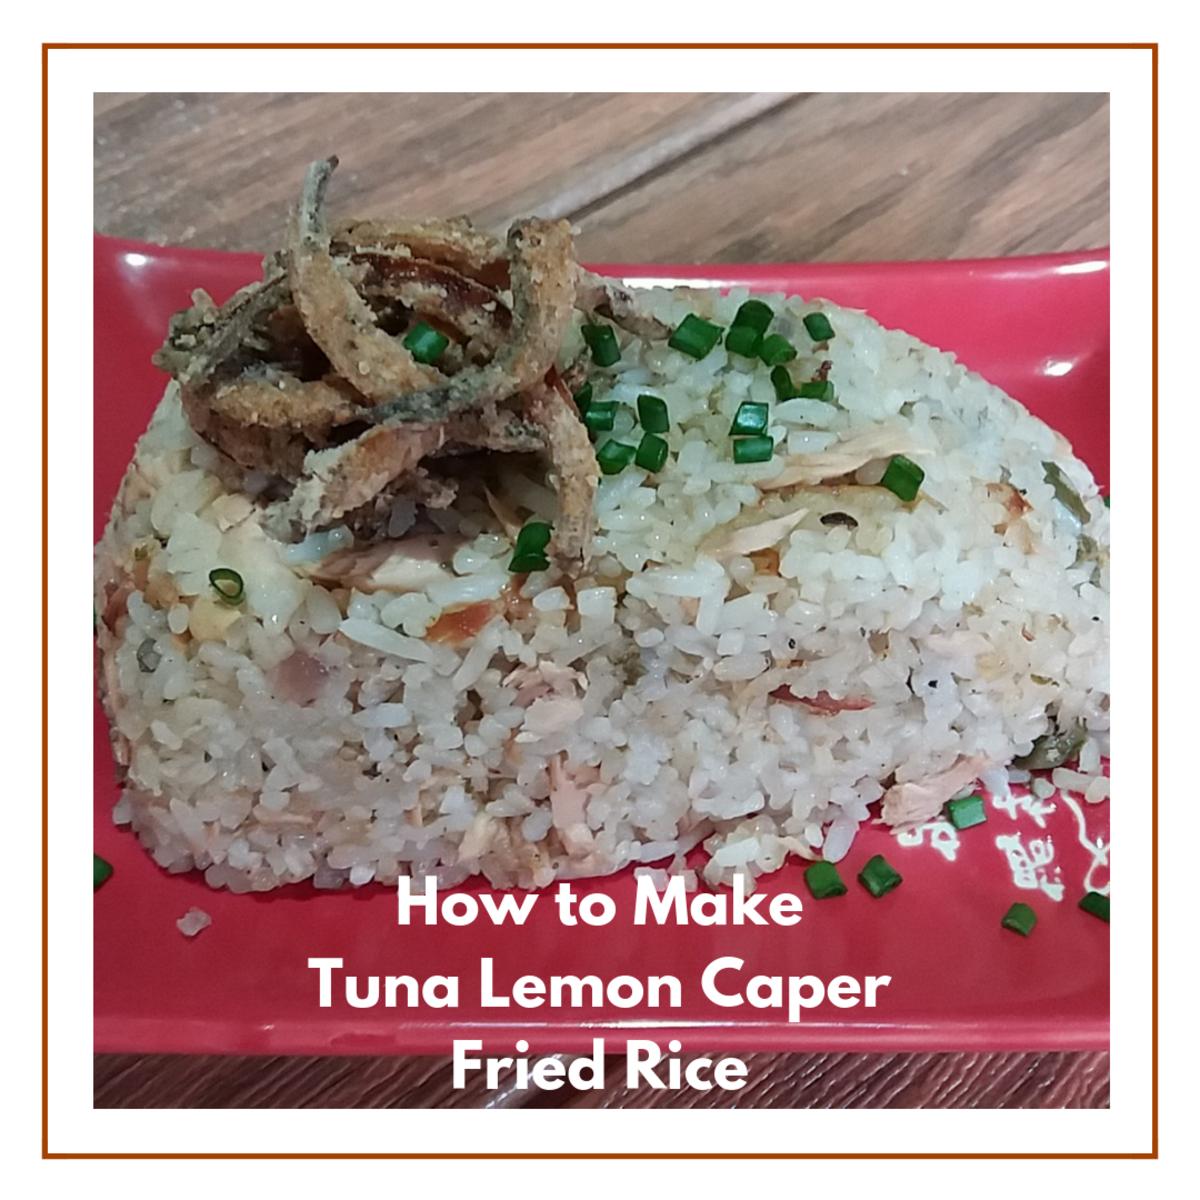 How to Make Tuna Lemon Caper Fried Rice